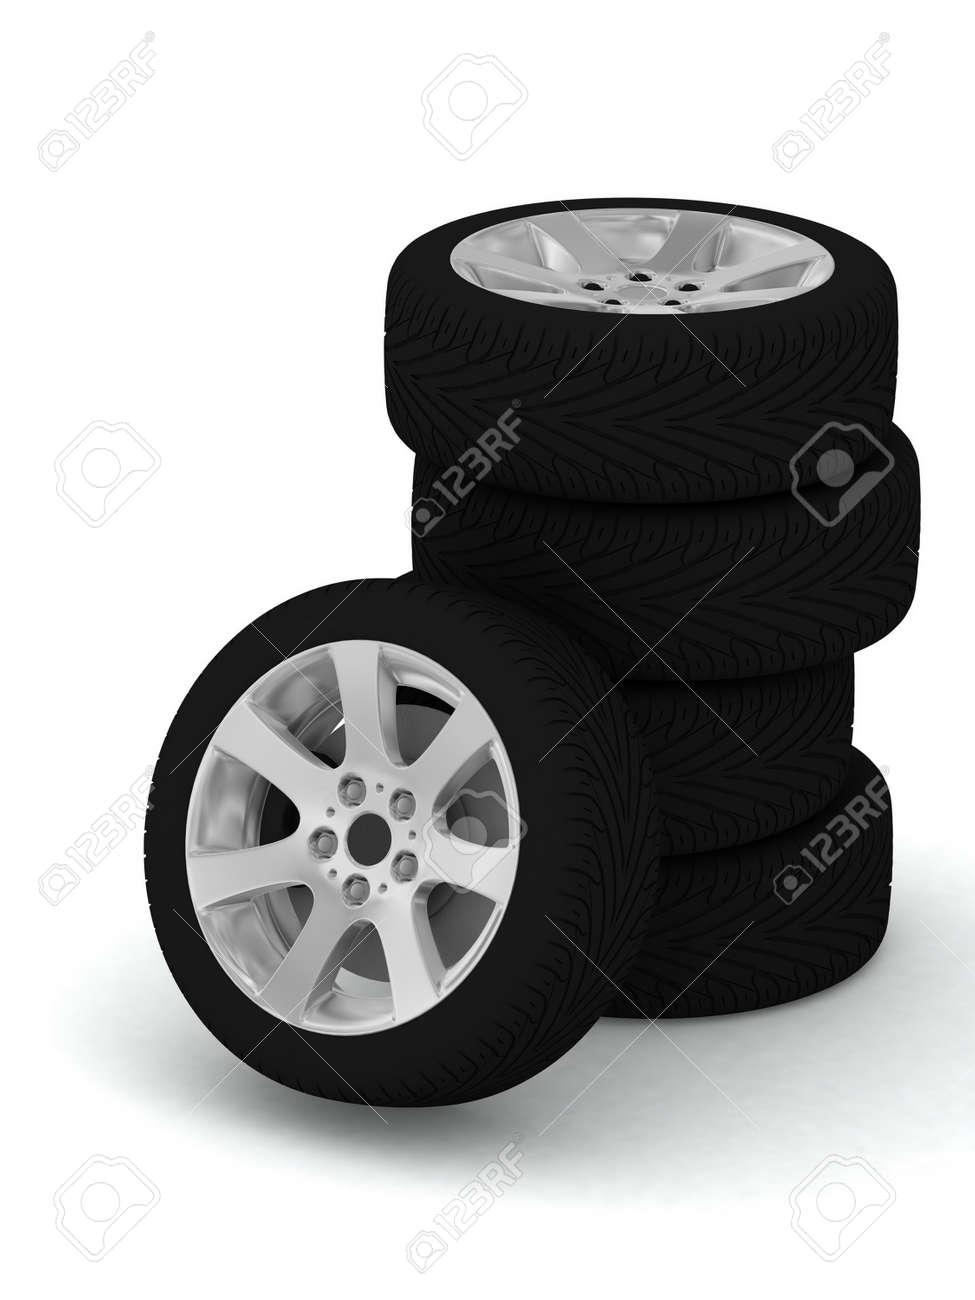 New wheels on white background Stock Photo - 12051701